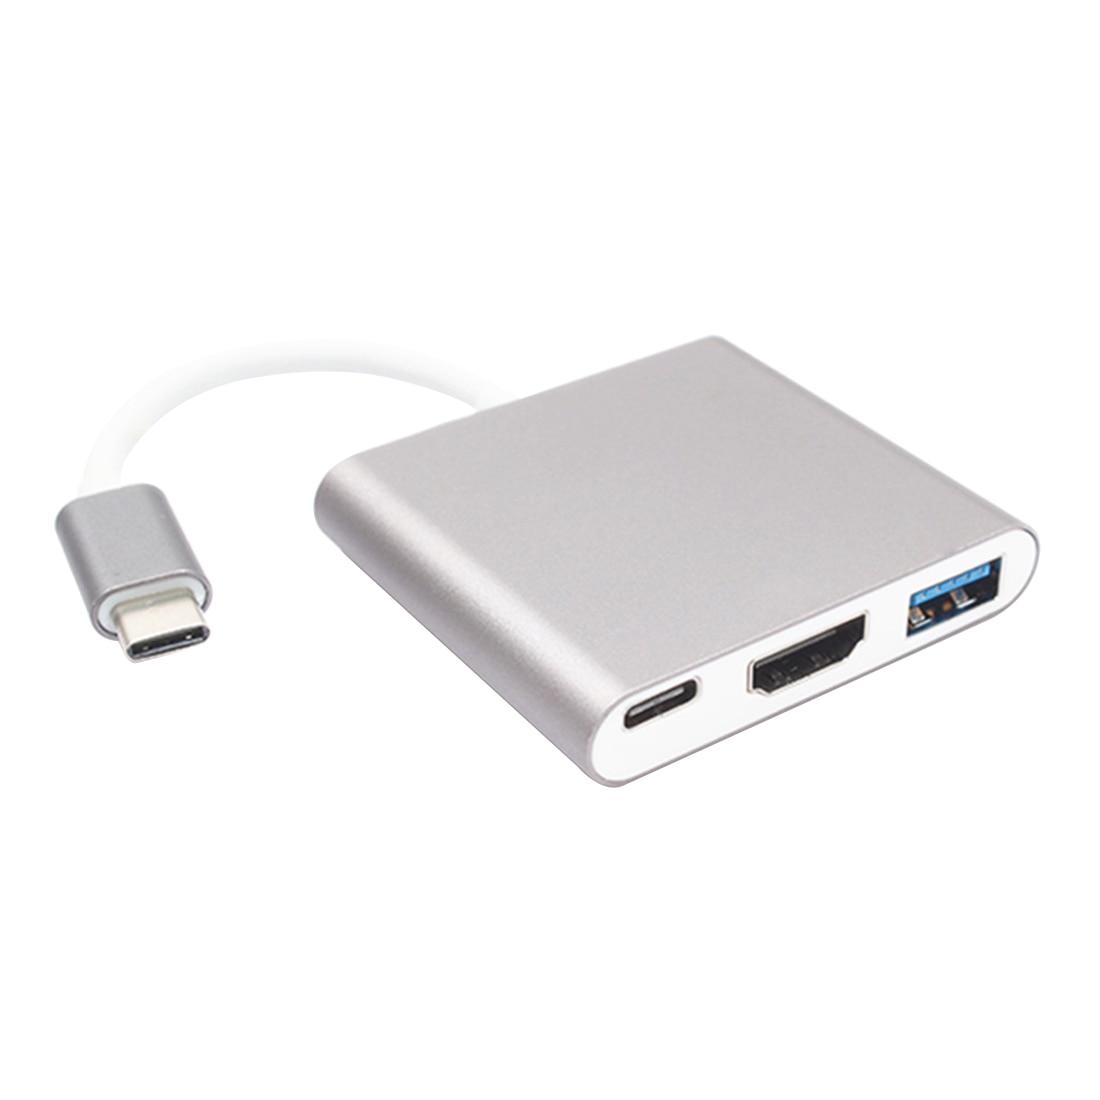 New USB 3.0 Type C Hub (USB-C & Thunderbolt 3 Ports Compatible) to USB 3.0/ HDMI/ Type C Female Charger Adapter Converter usb 3 1 type c usb c multiple 3 ports 3 0 hub